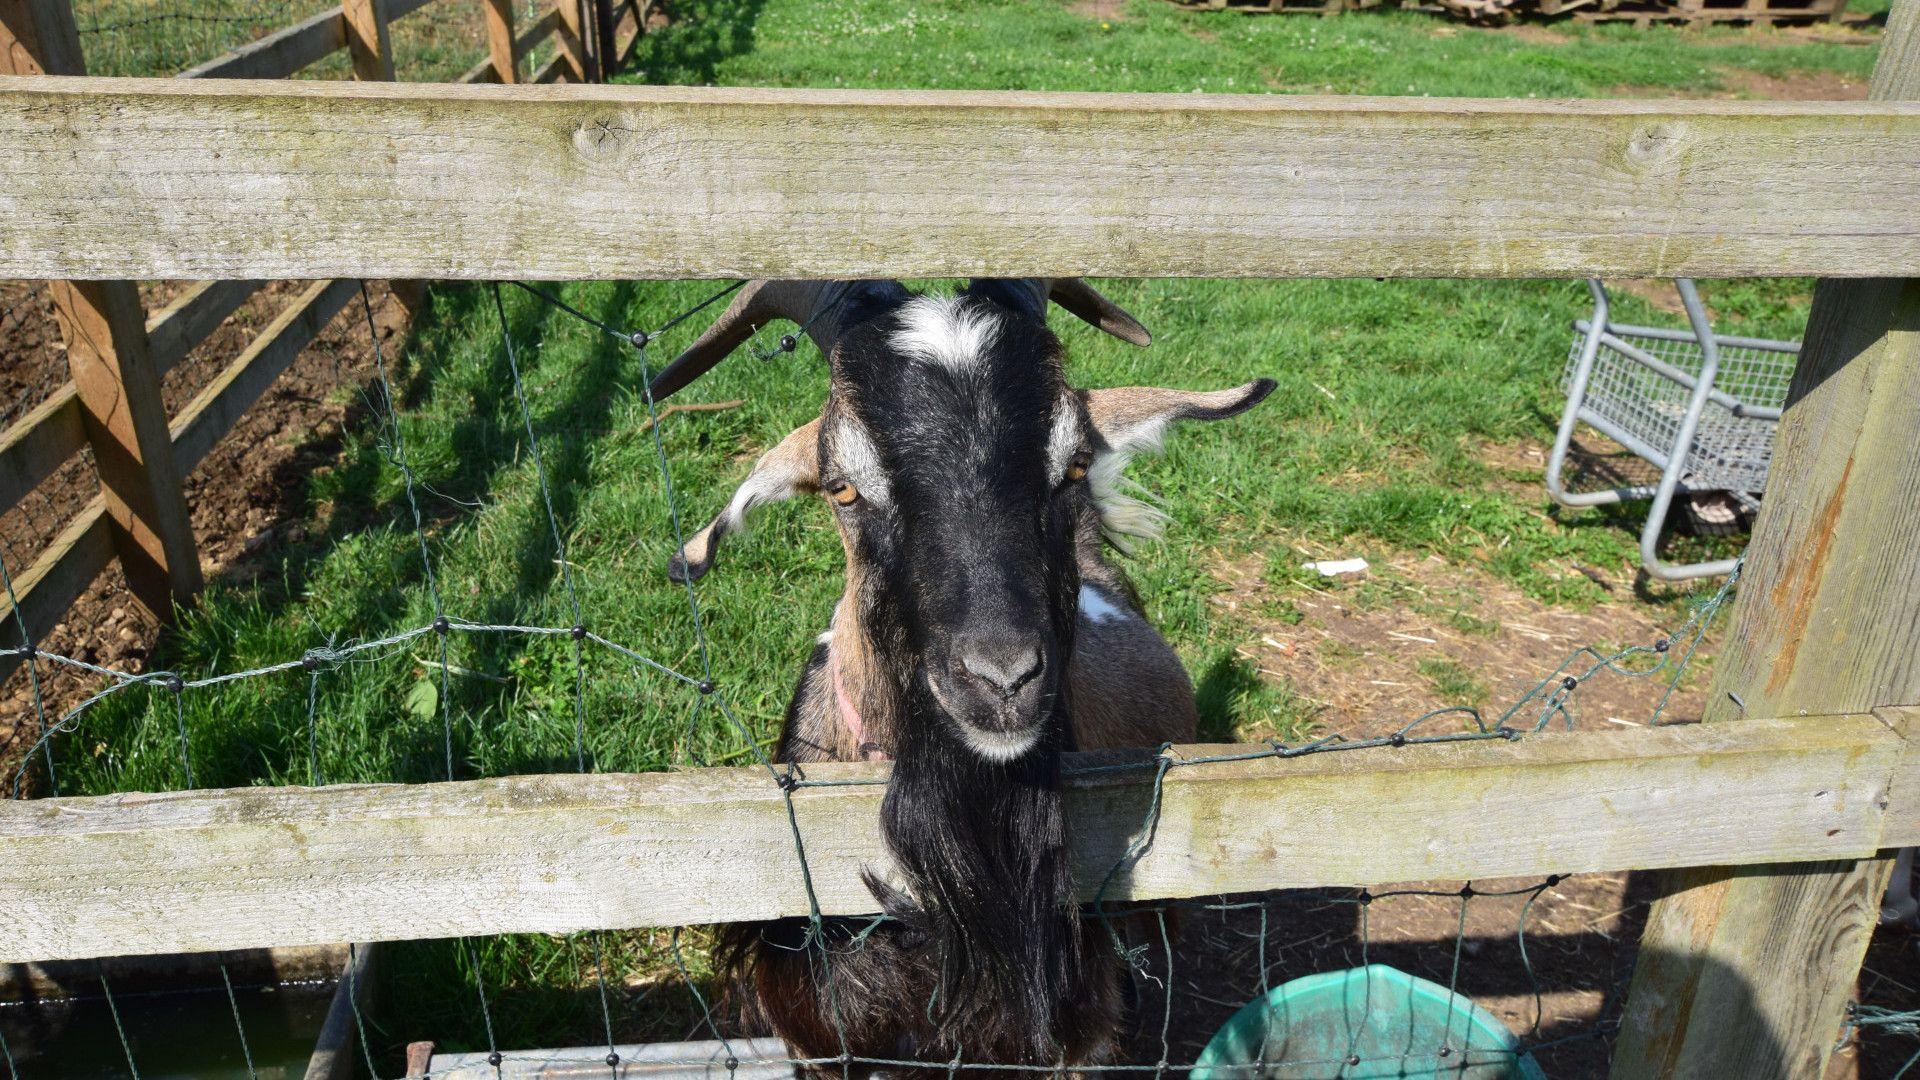 Friendly goats on-site, Shepherds Hut at Avon Farm, Bolthole Retreats